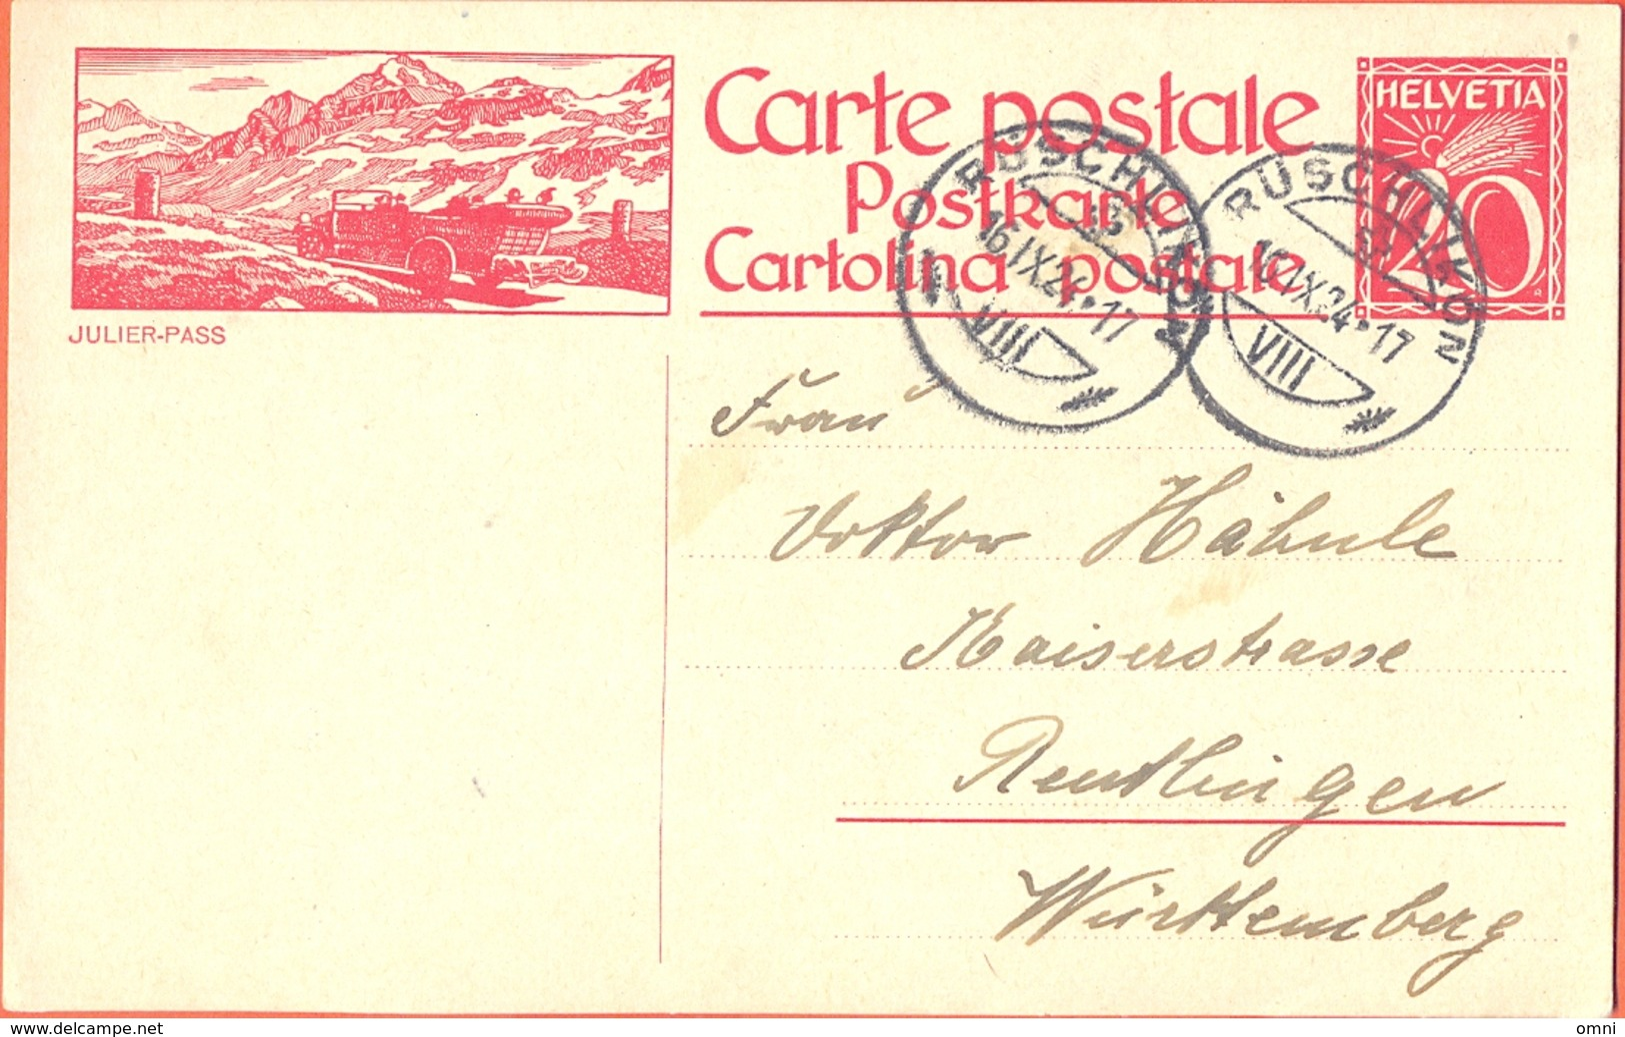 Postal Stationery Switzerland, Schweiz, Stationery Circuled Entier Ganzsache Julier Pass Postauto Autobus 1924 Fine Used - Interi Postali